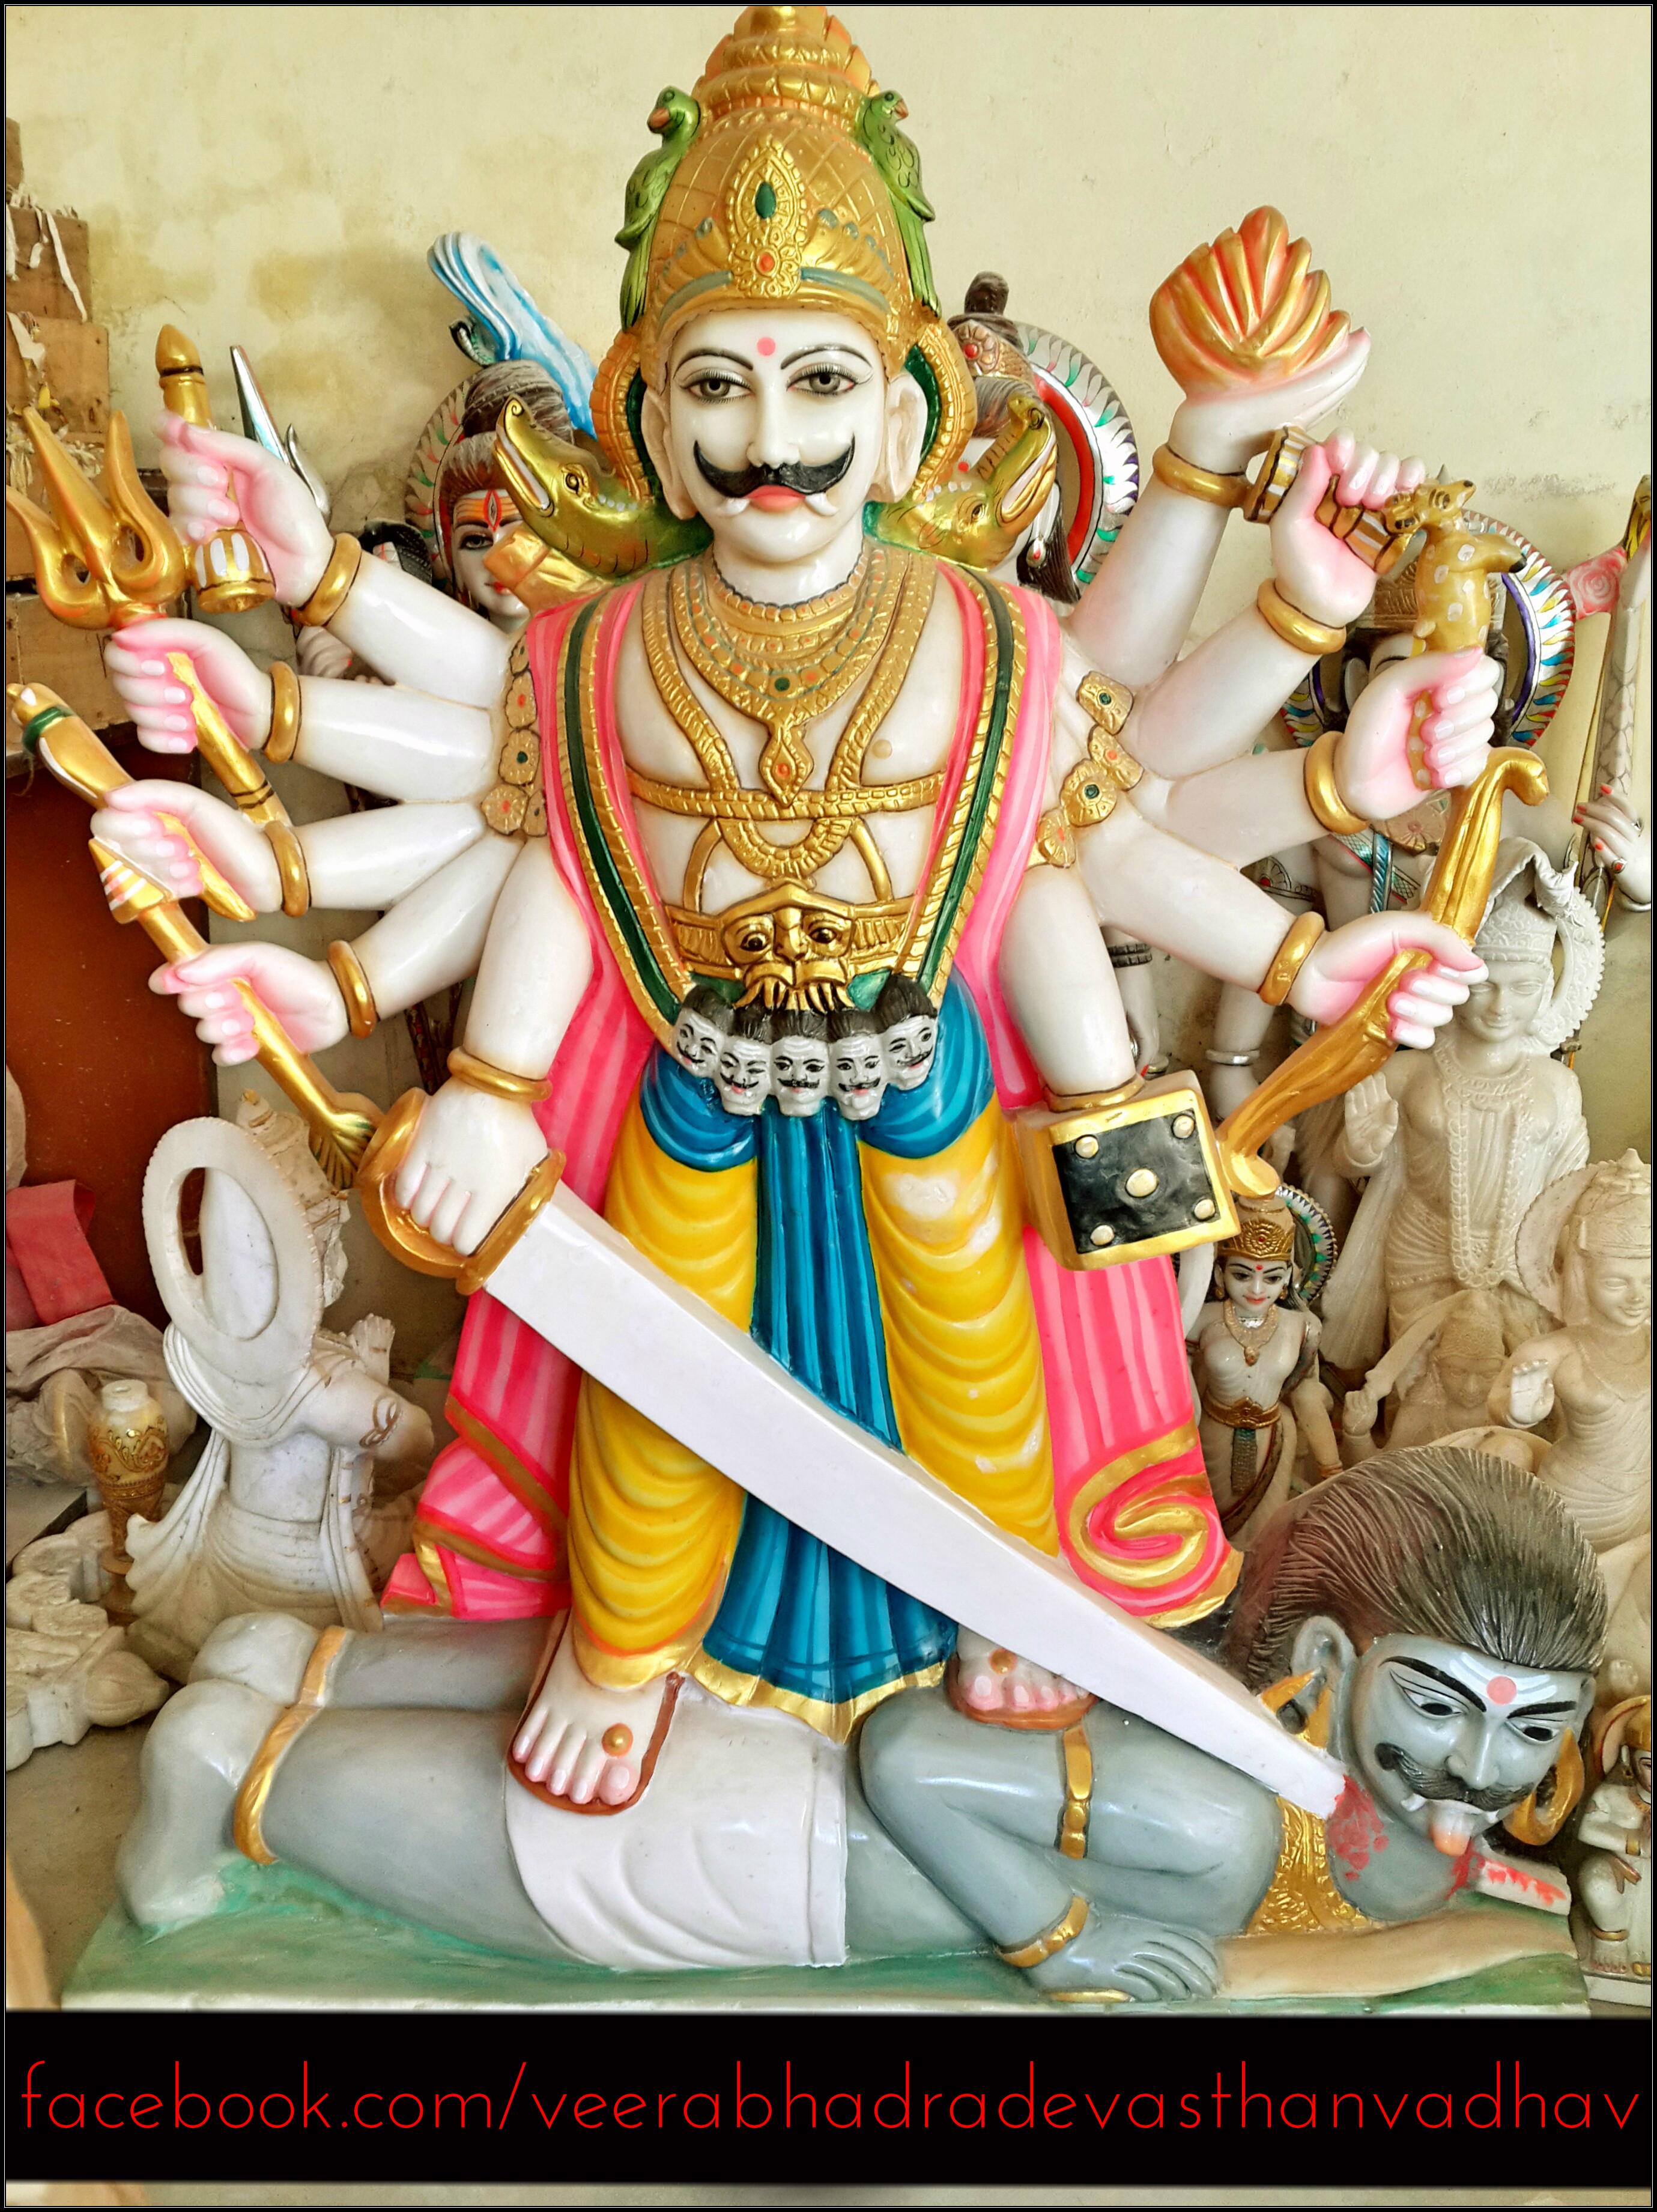 Must see Wallpaper Lord Bhadrakali - A_statue_of_Veerabhadra_at_%27_%27_%27_Veerabhadra_devasthan-vadhav%27_%27_%27%2CTal-pen%2CDis-raigad%2CMaharashtra  You Should Have_45895.jpg